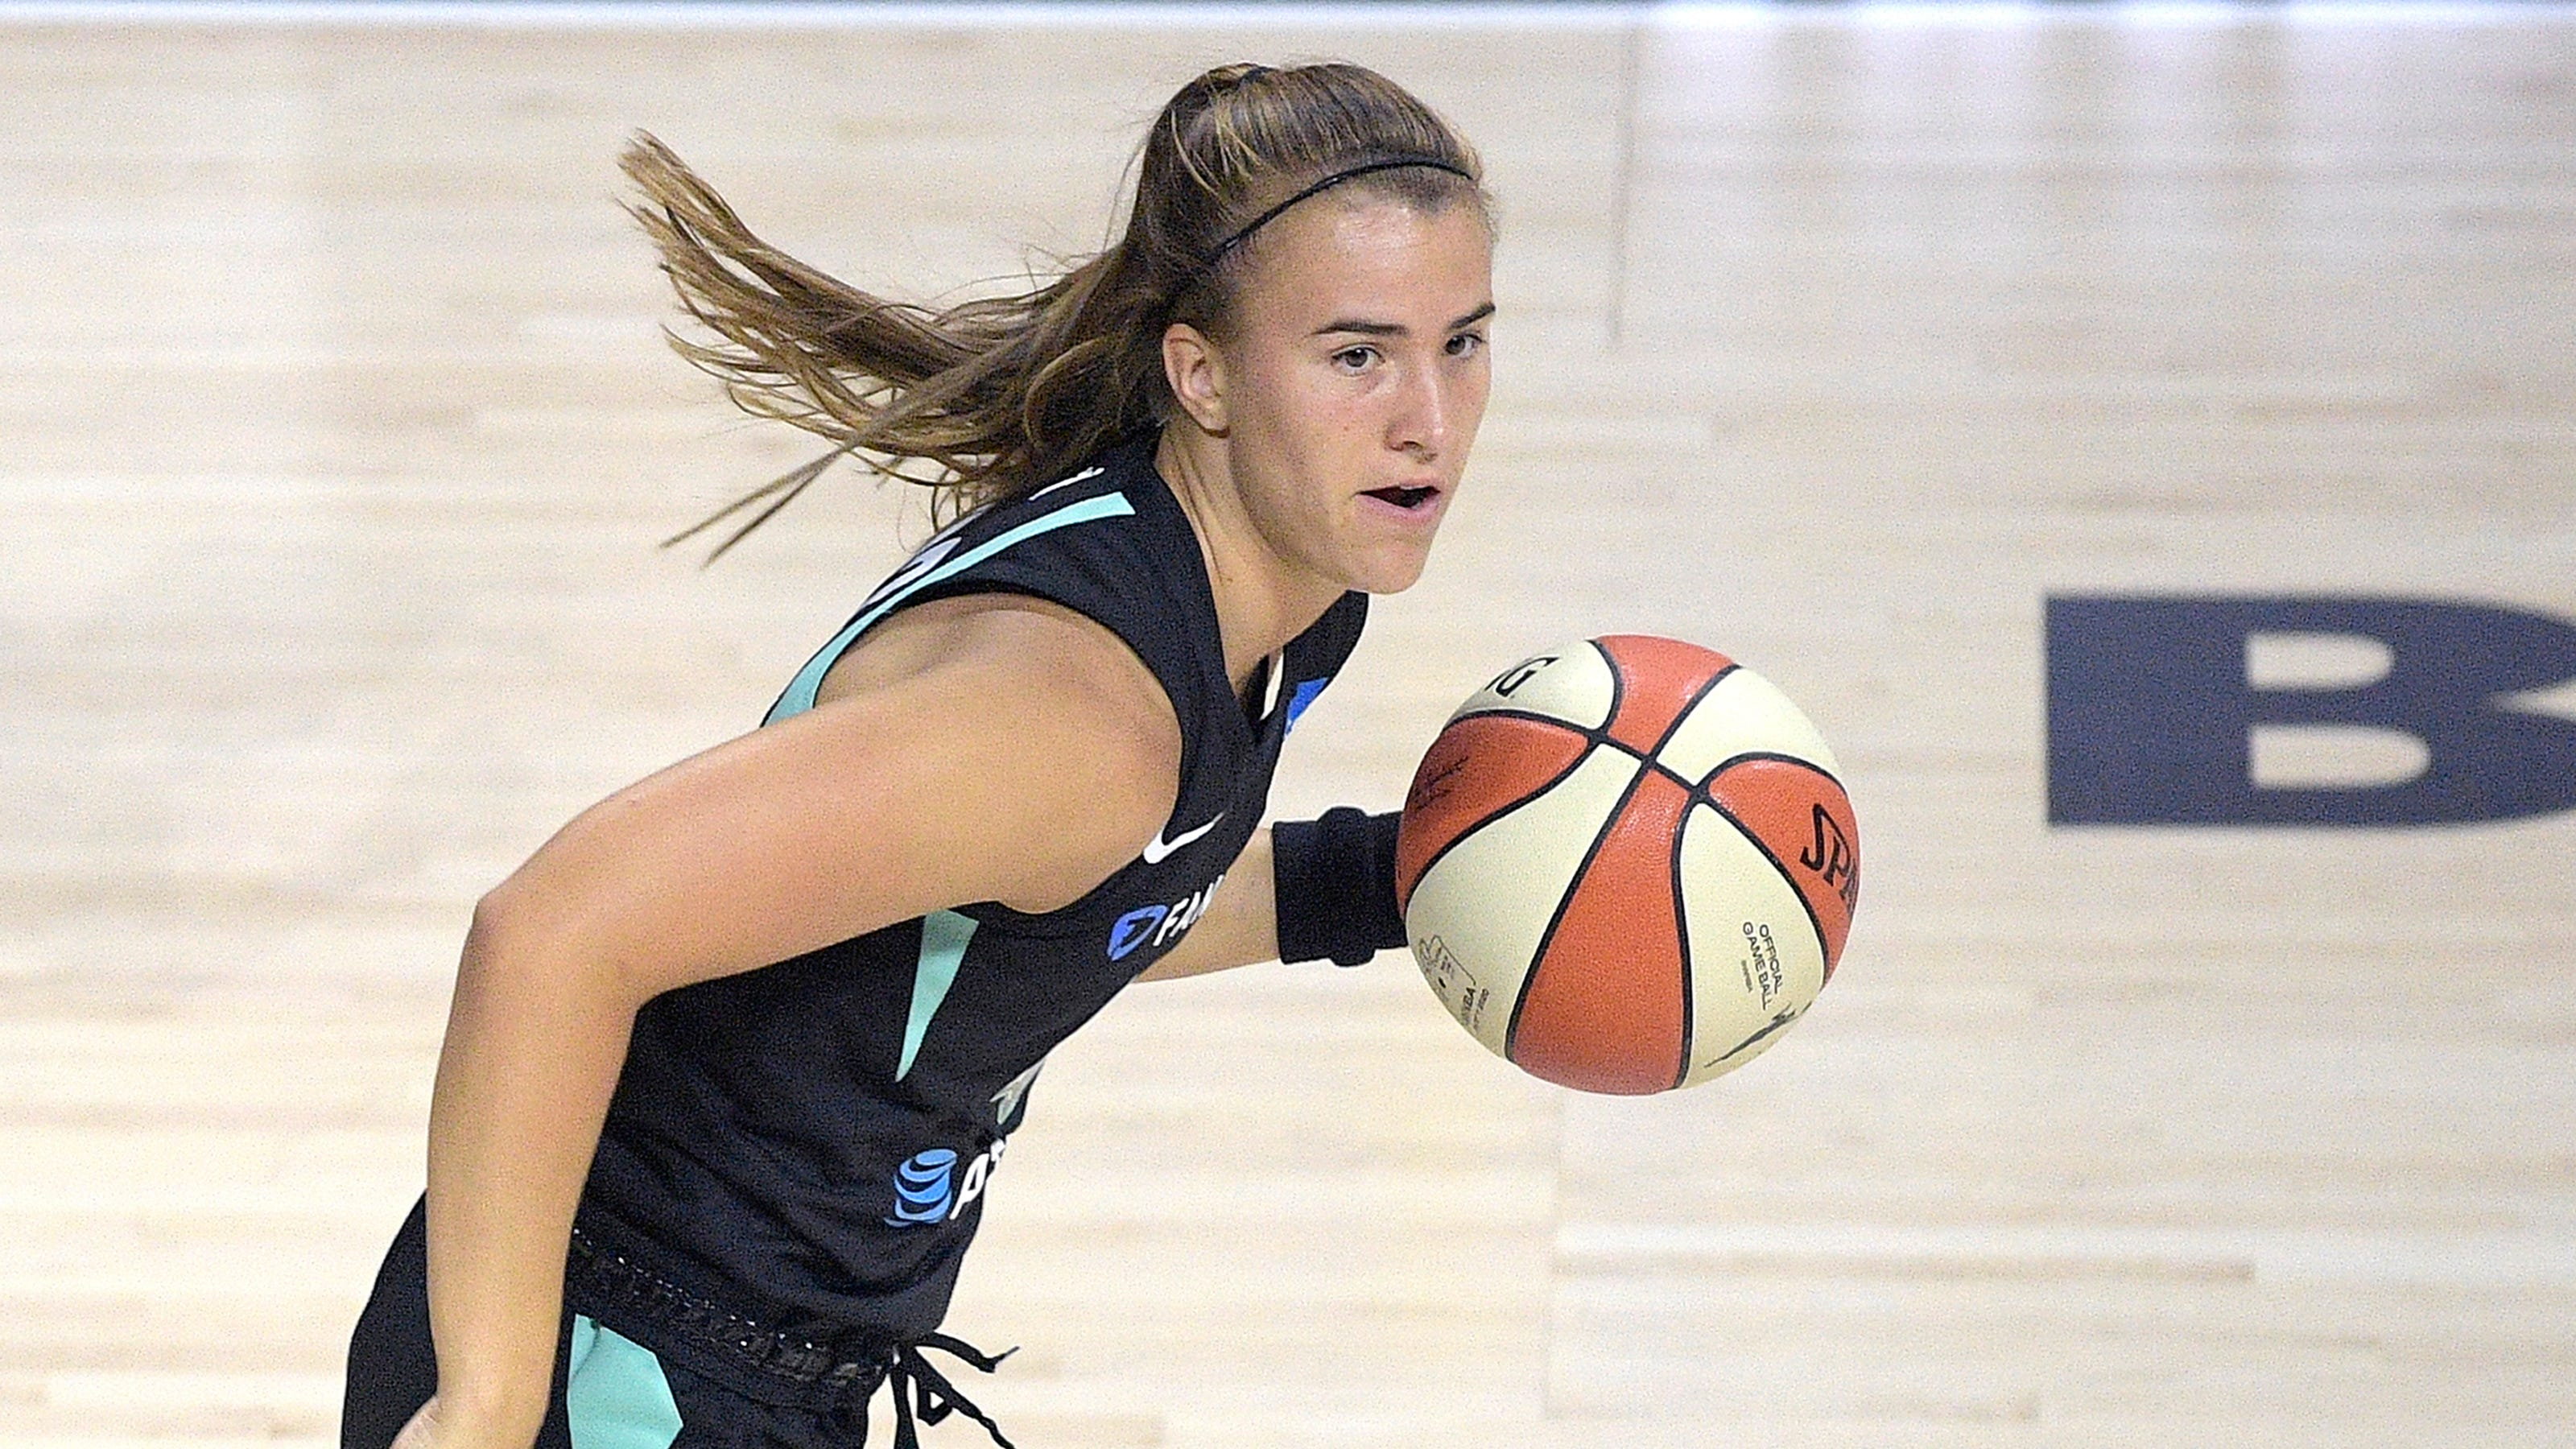 2021 WNBA season kicks off: How to watch, live stream games in league's 25th season